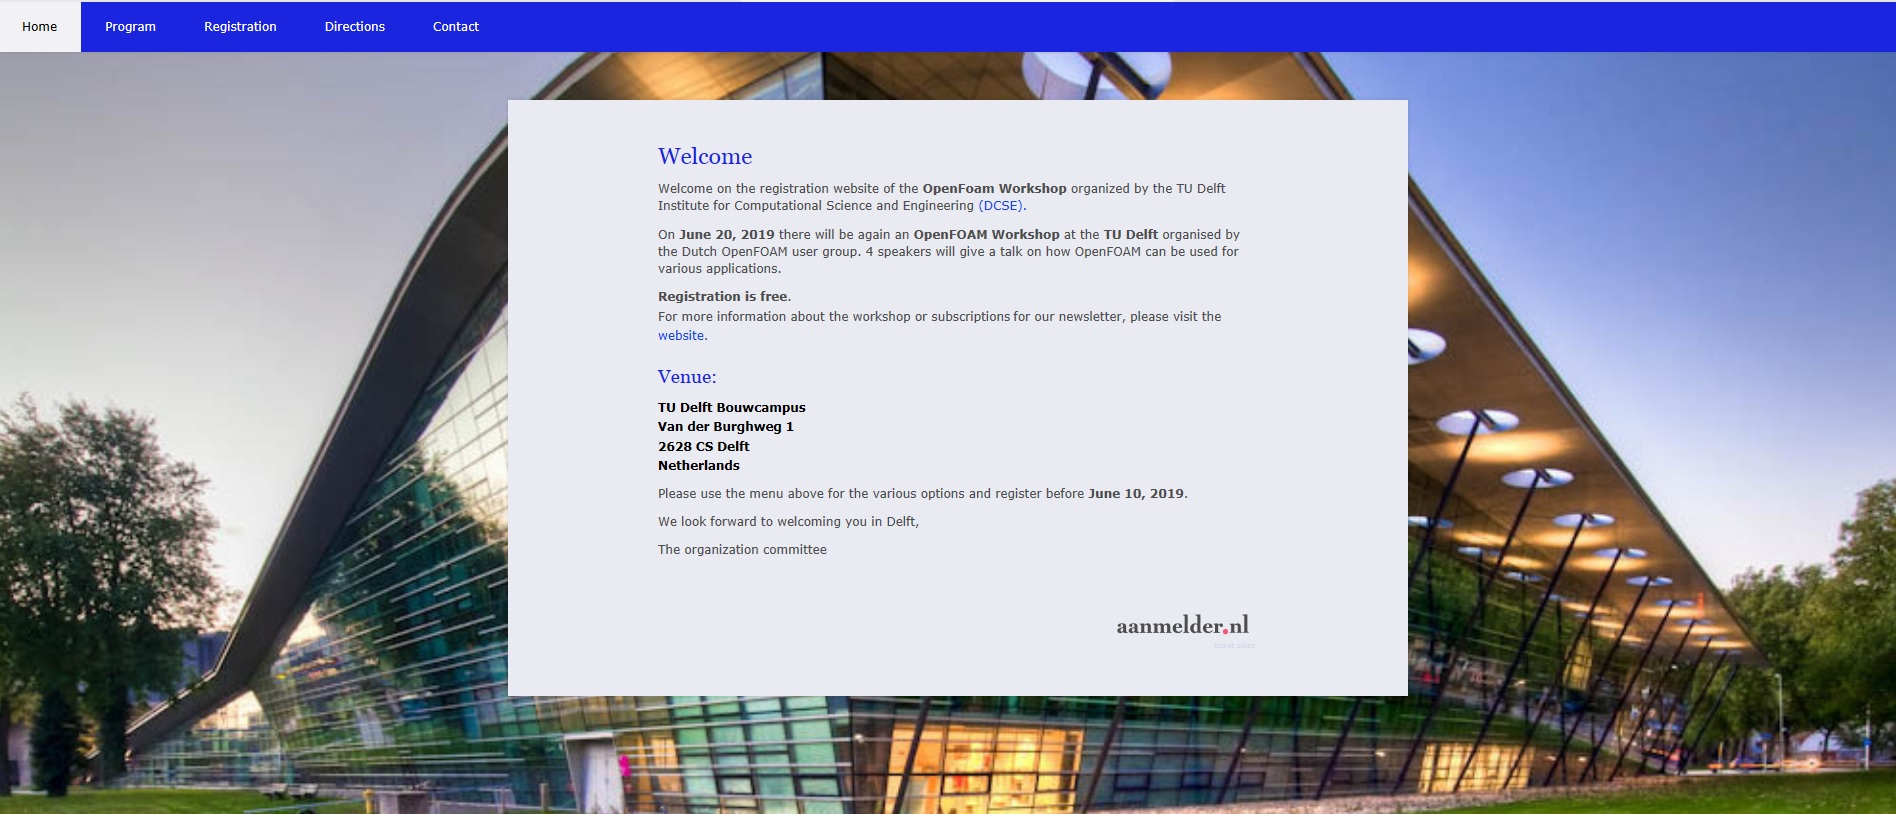 /newsletter/upload/OpenFOAM_Workshop_on_June_20_2019.jpg